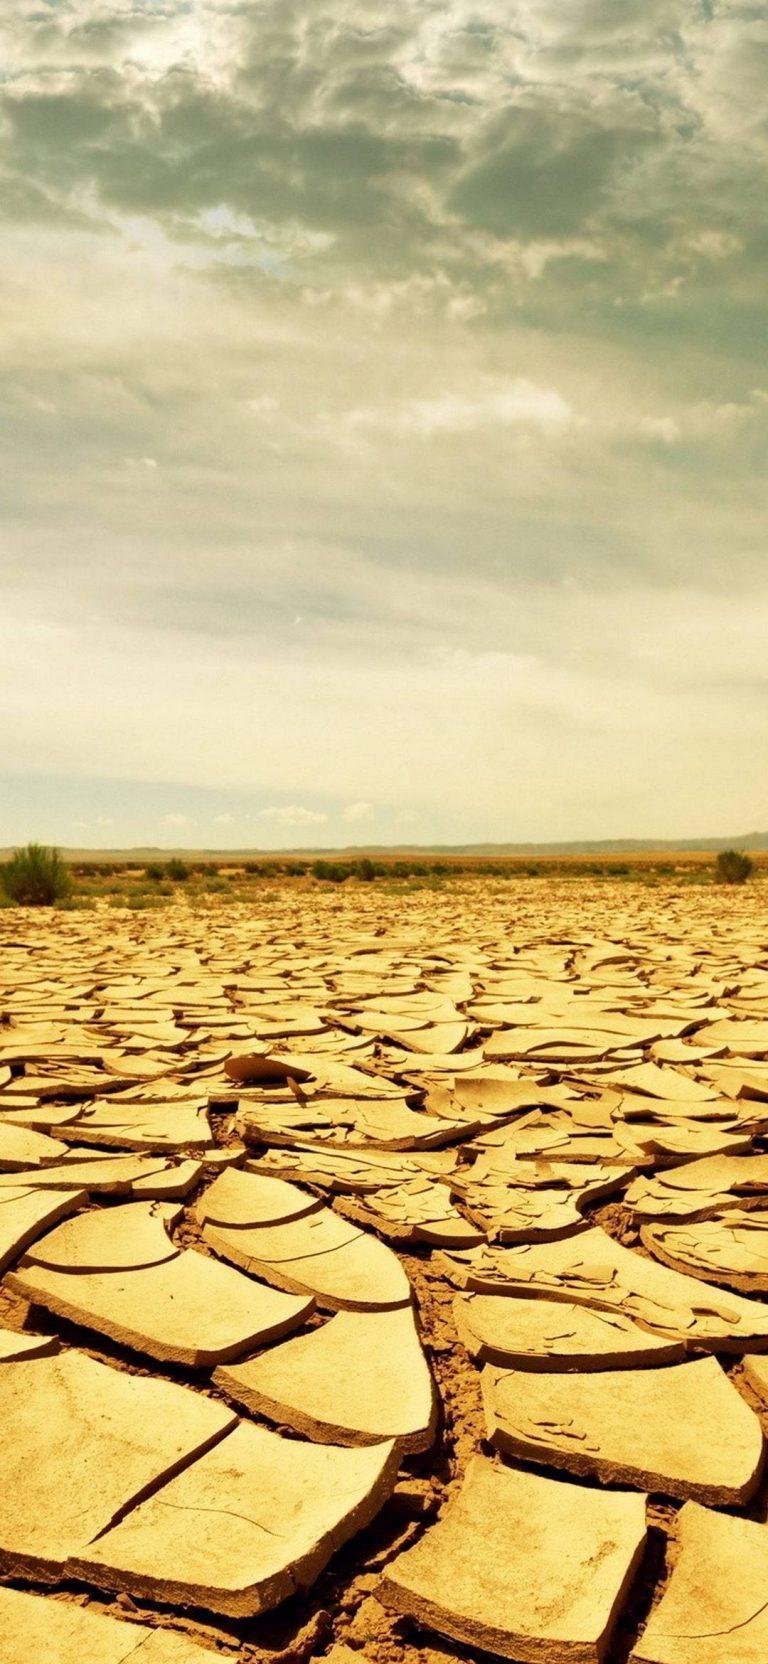 Drought Land 1080x2340 768x1664